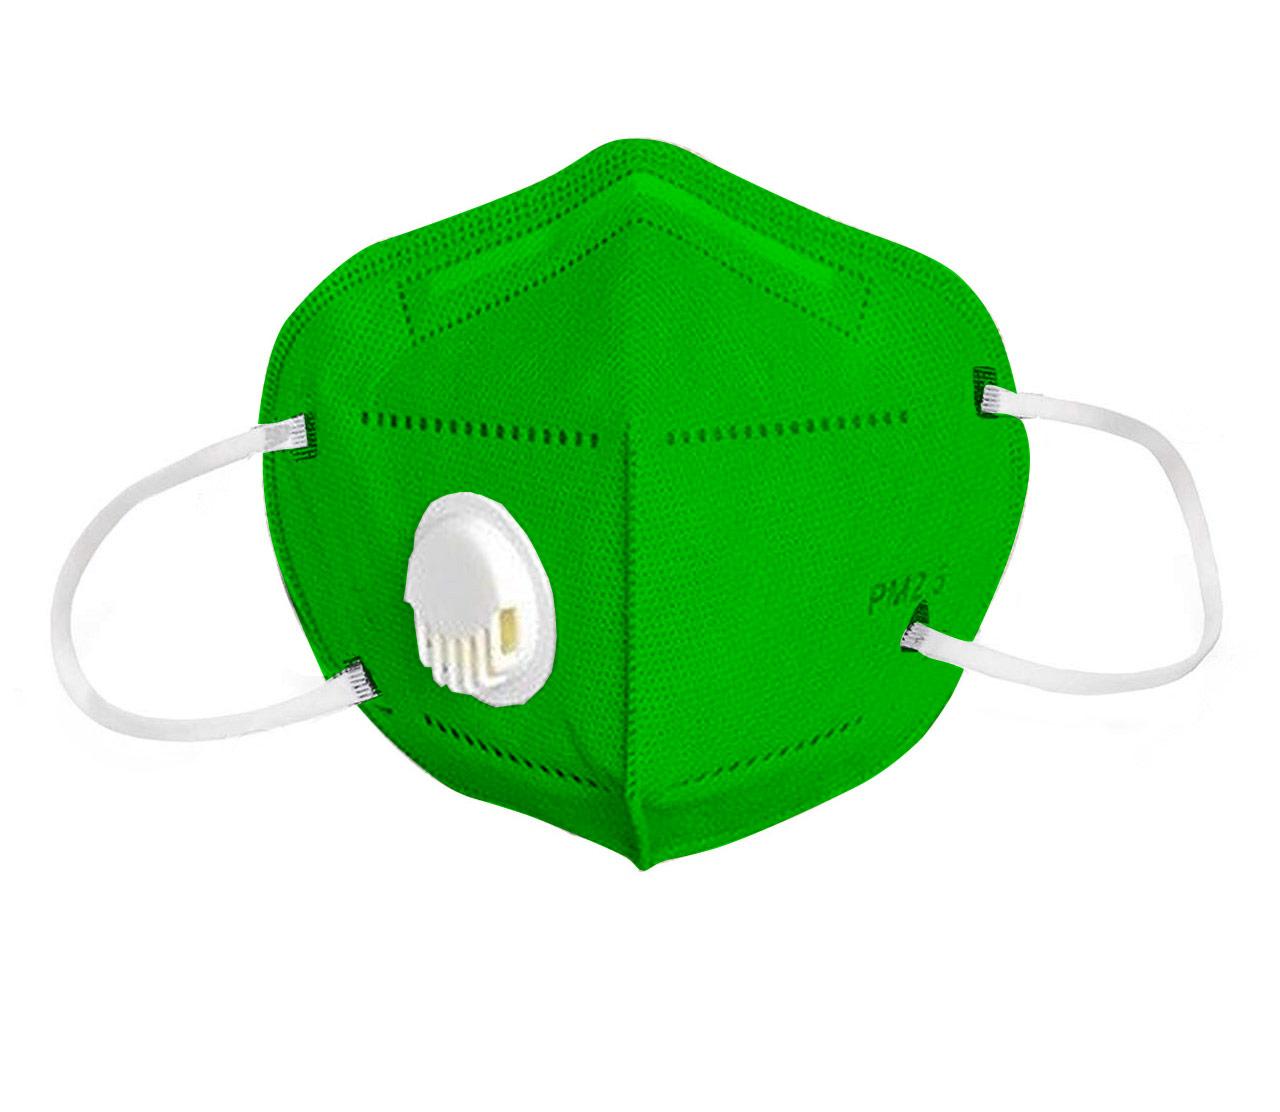 Reusable Face Mask green-2 pack